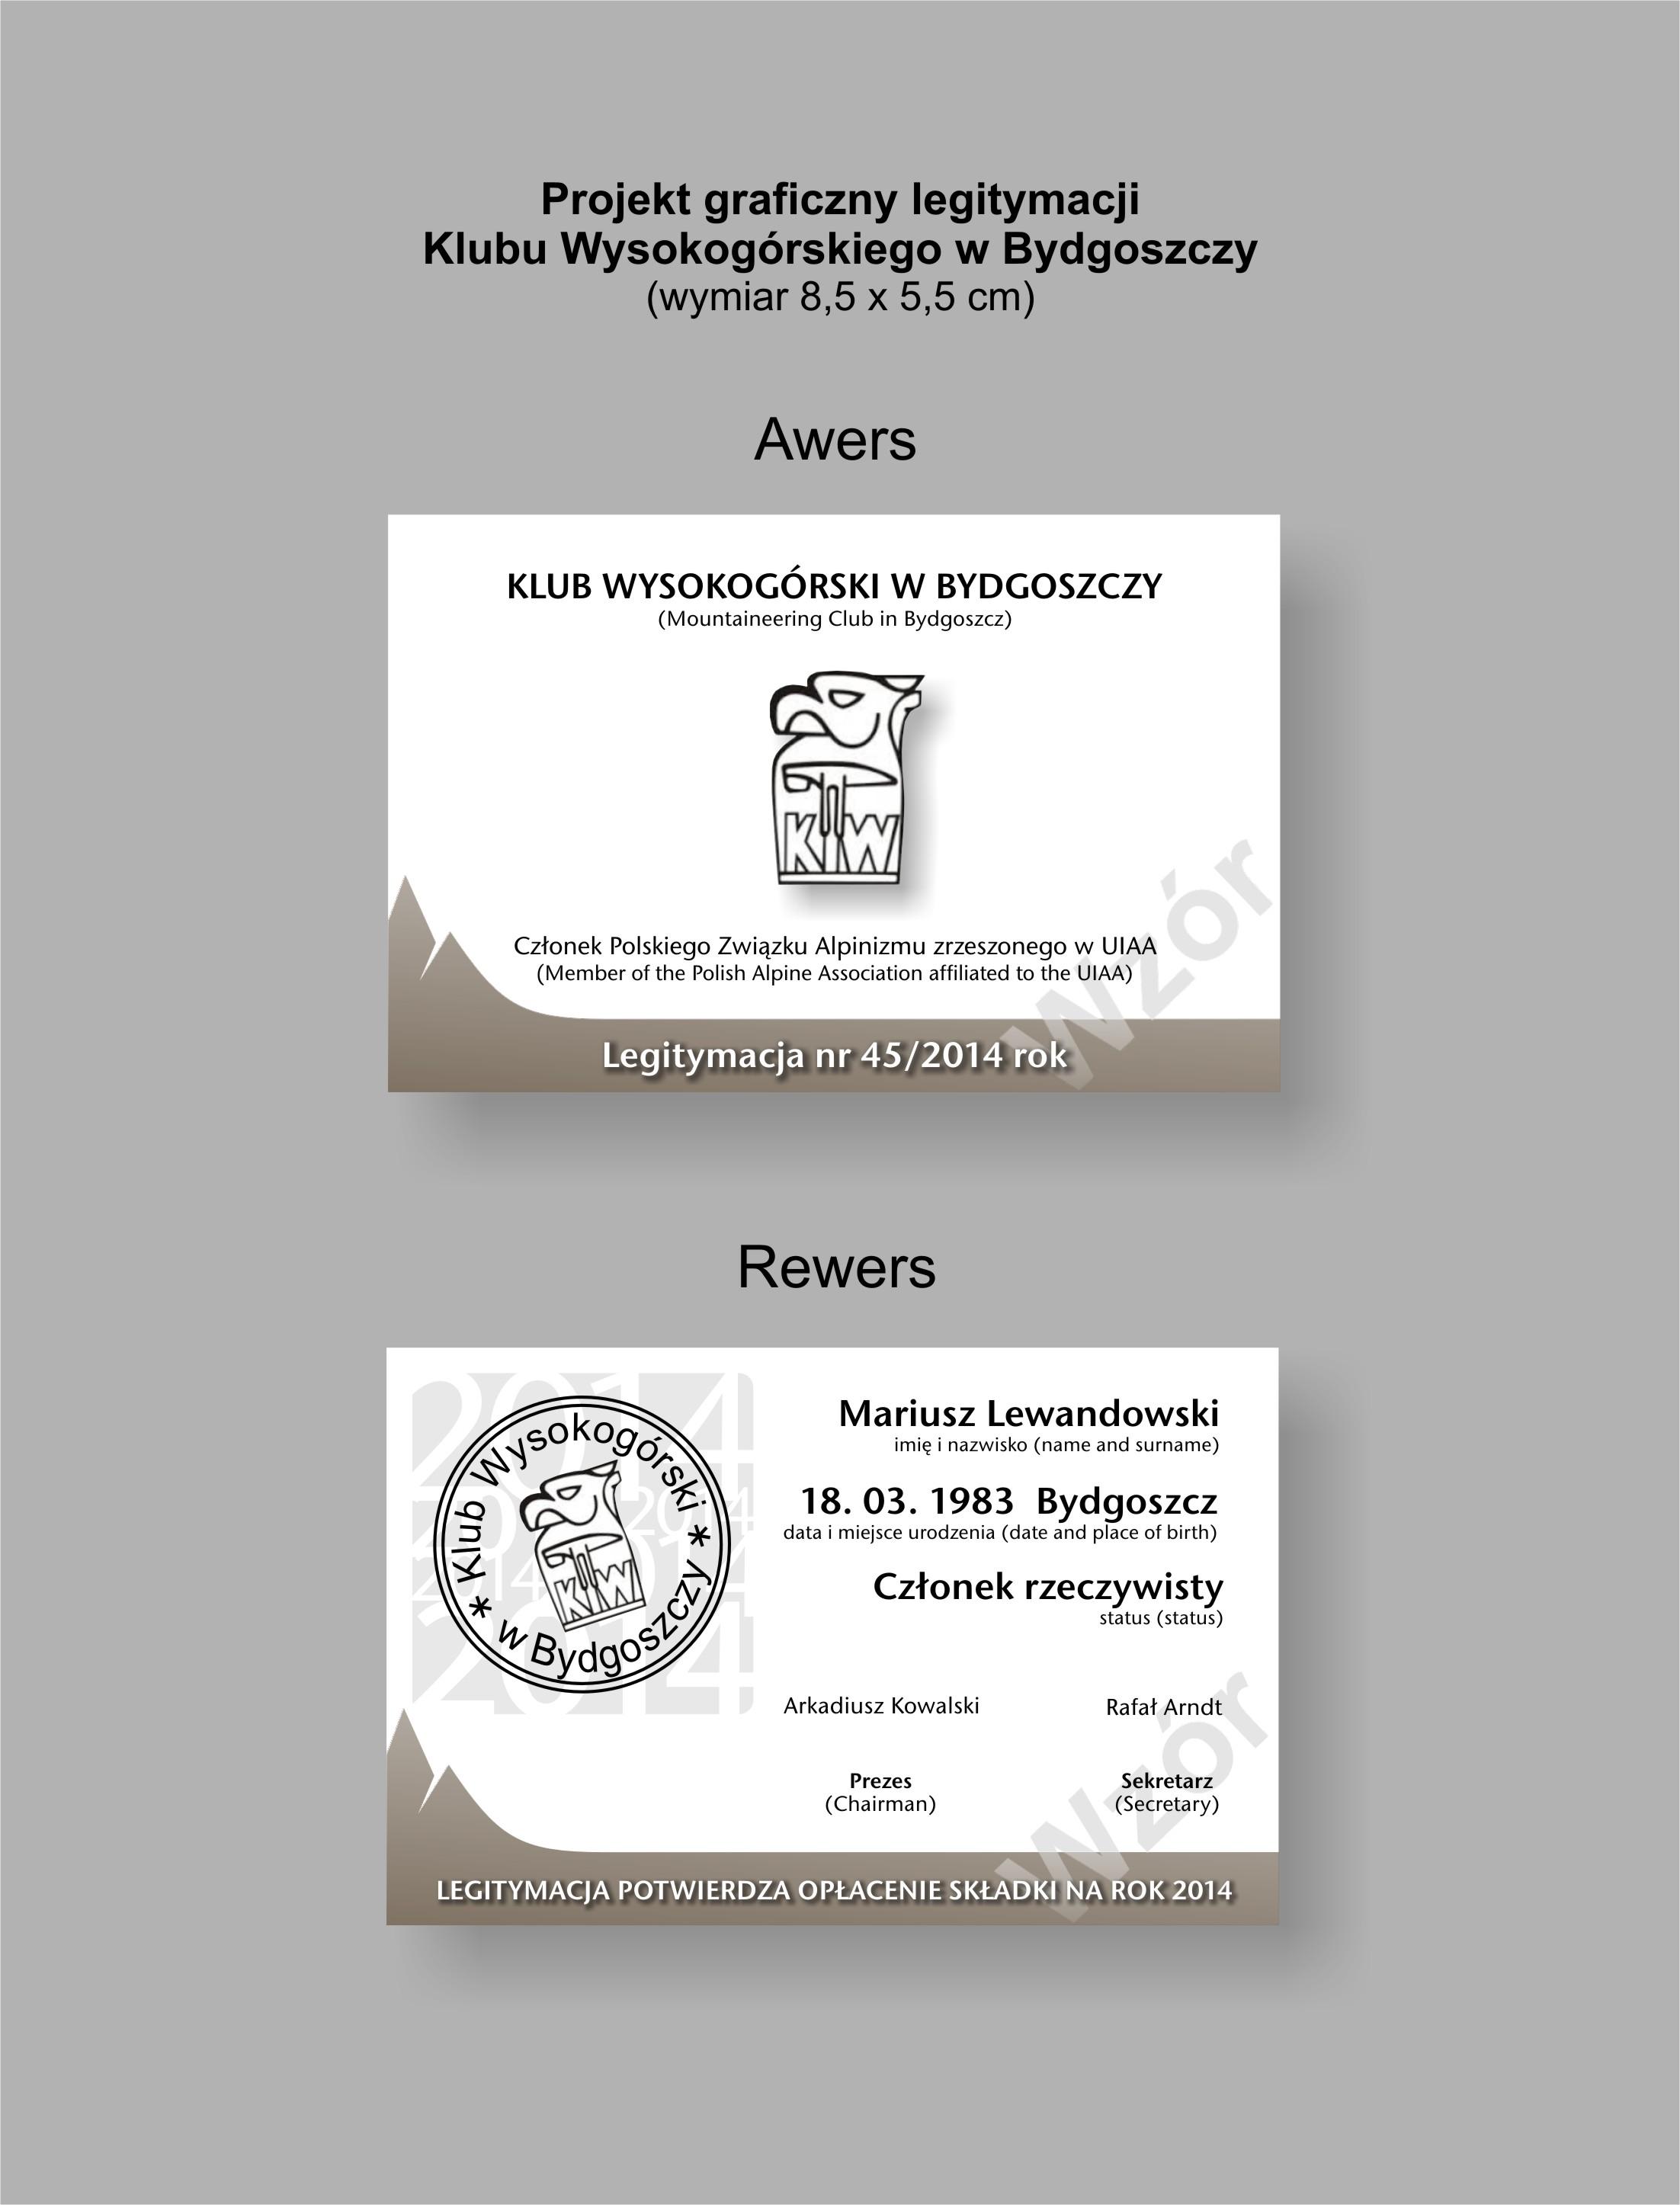 Legitymacja KW - projekt Wojtek Bonk